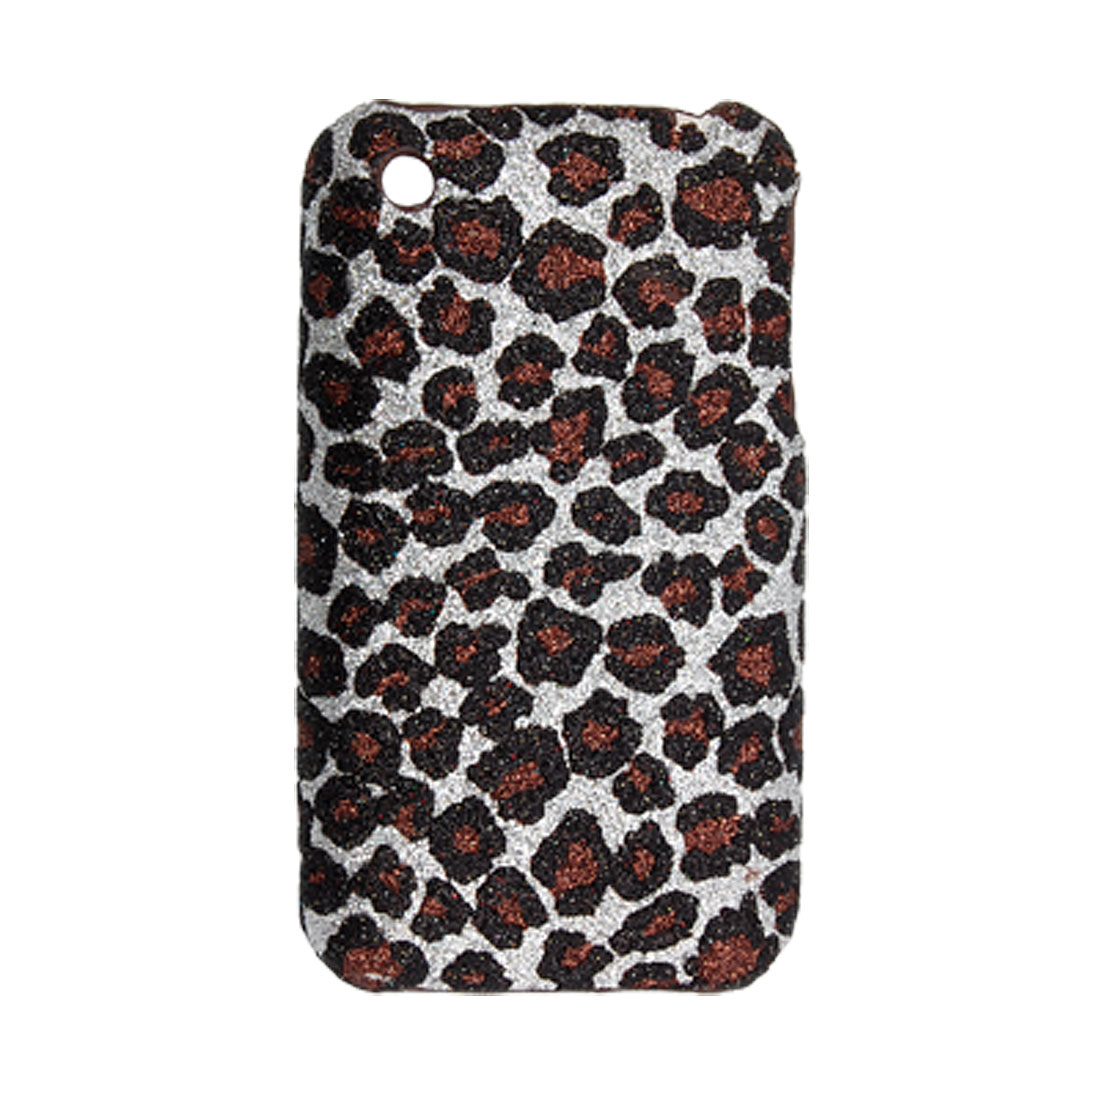 Glittery Leopard Plastic Nonslip Back Case Shell for iPhone 3G